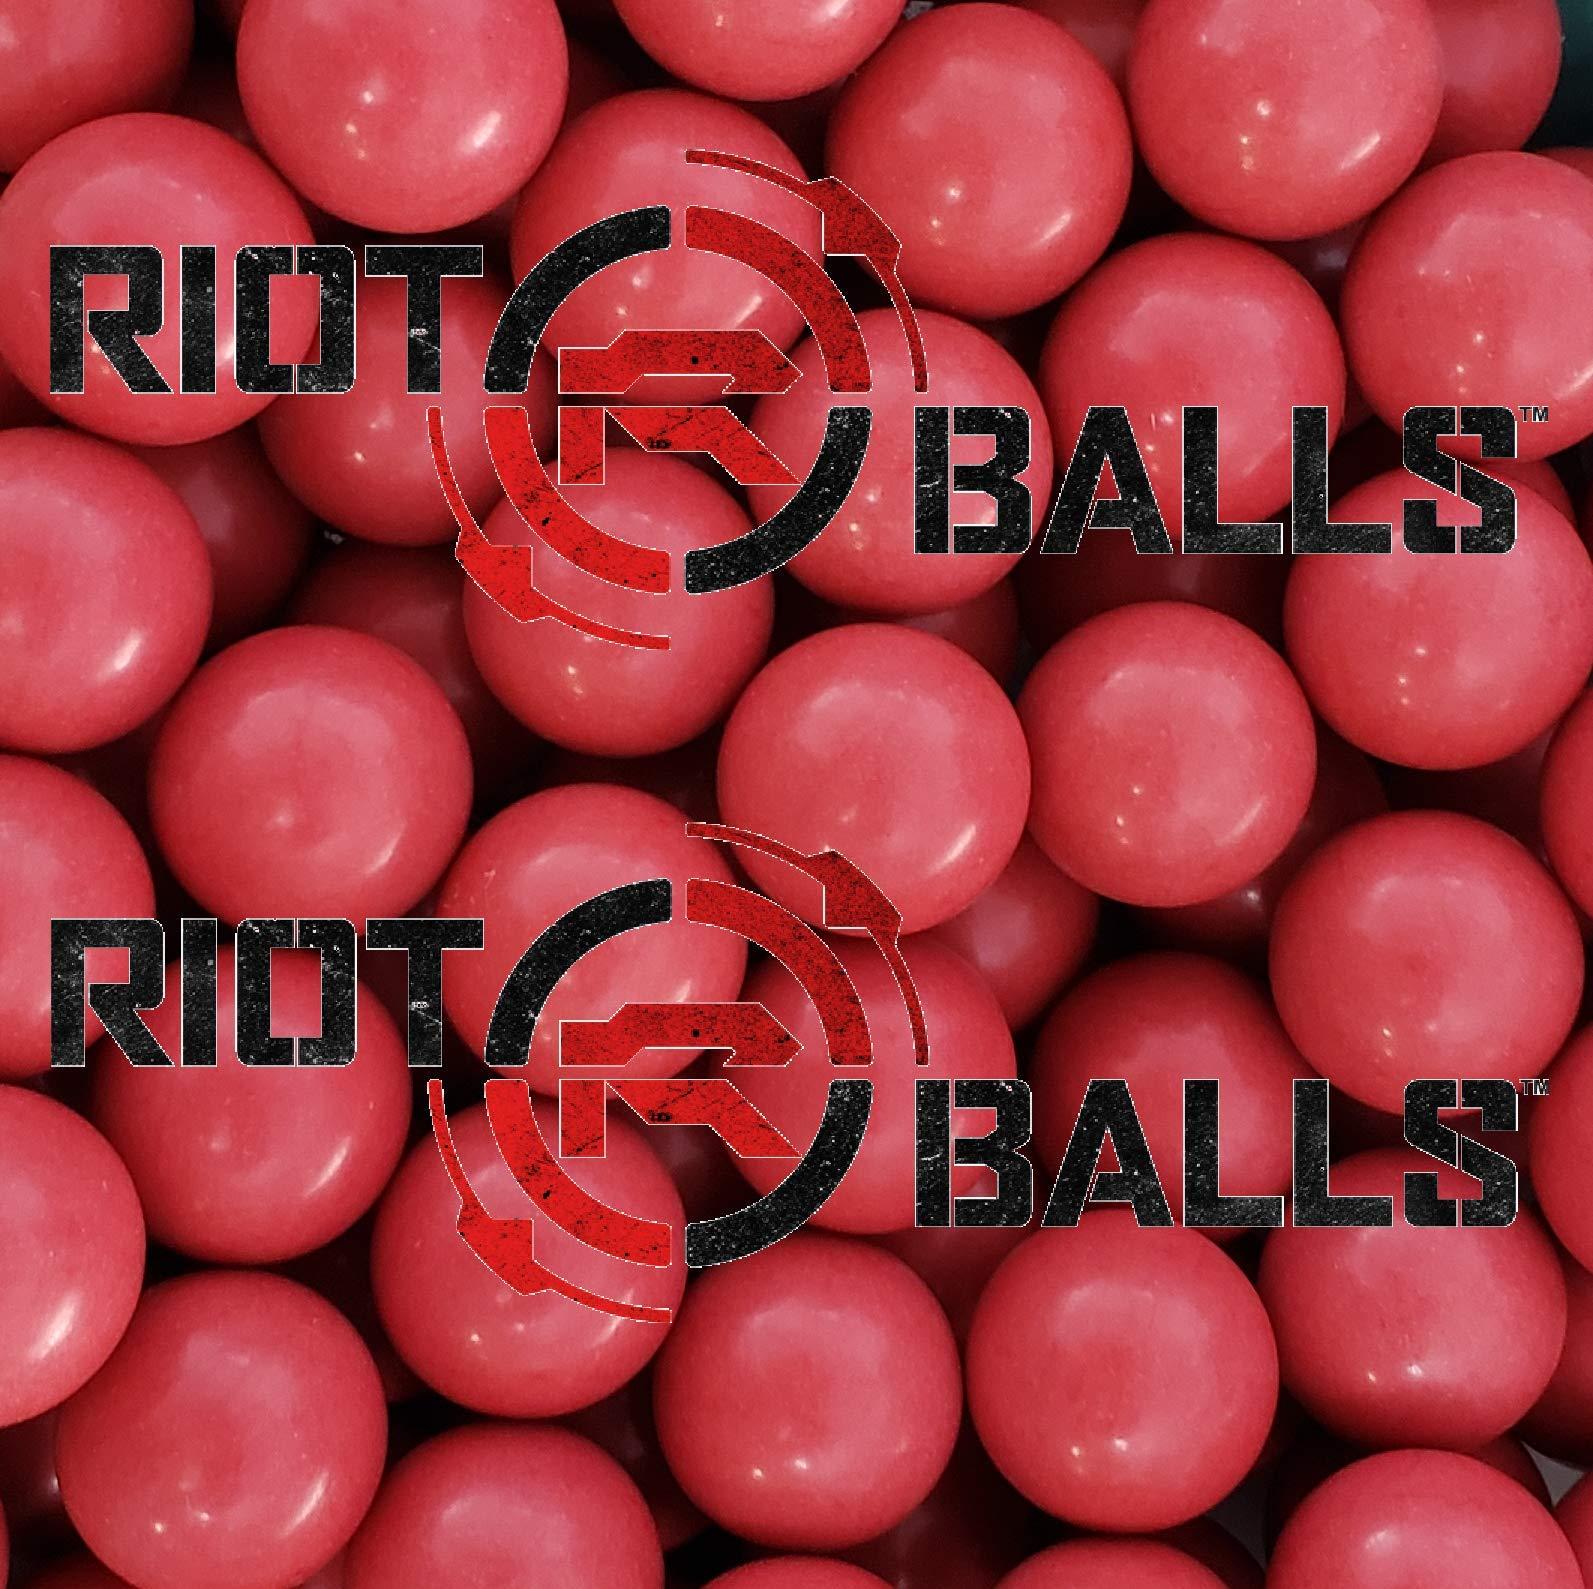 100 X 0.68 Cal. PVC/Nylon Riot Balls Self Defense Less Lethal Practice Paintball by Riot Balls